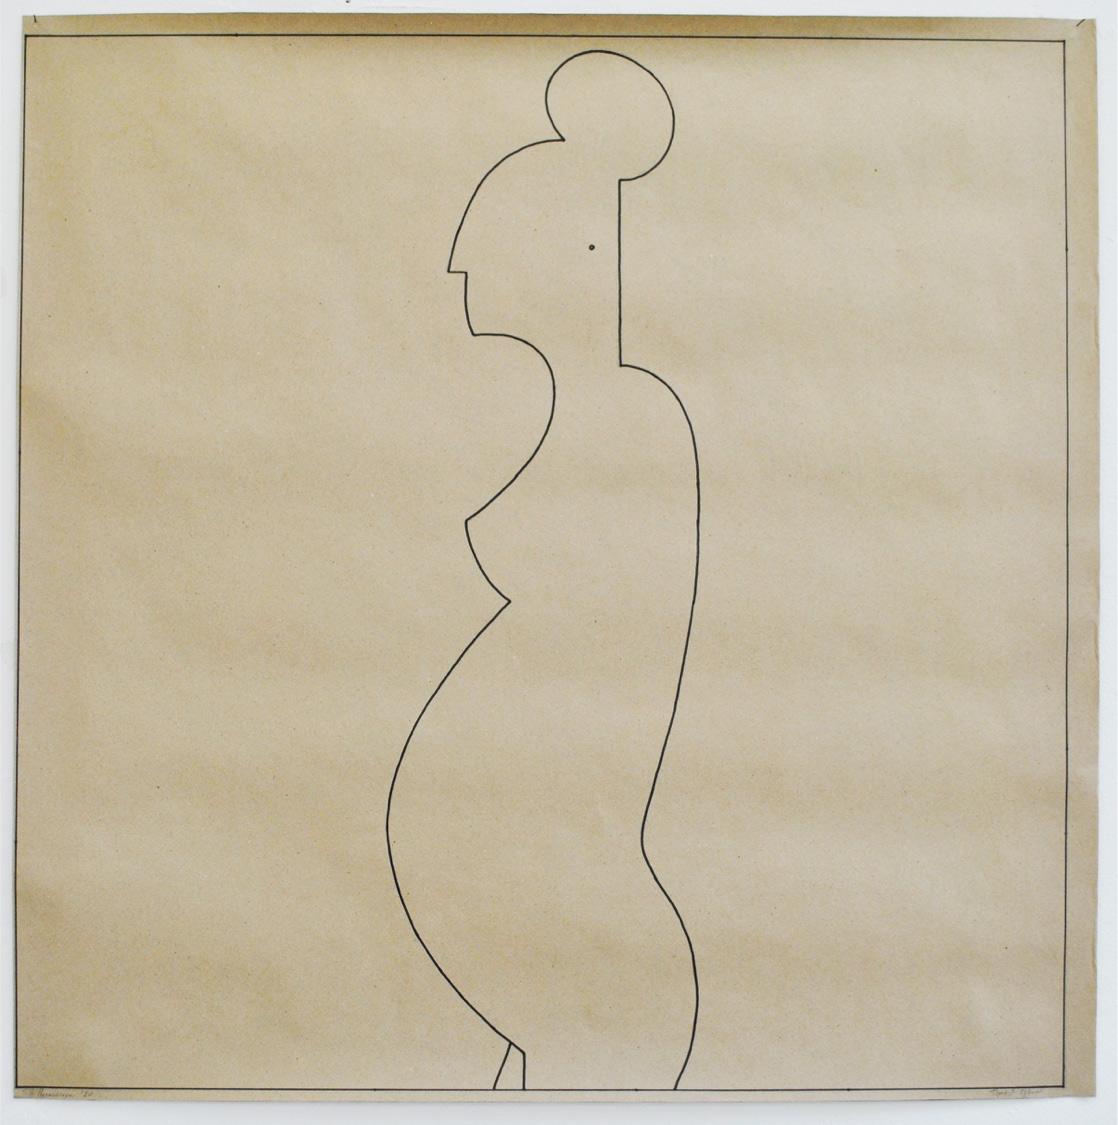 Ilias Papailiakis, Pregnant woman in profile, Ink on paper, 100x100 cm, 2020